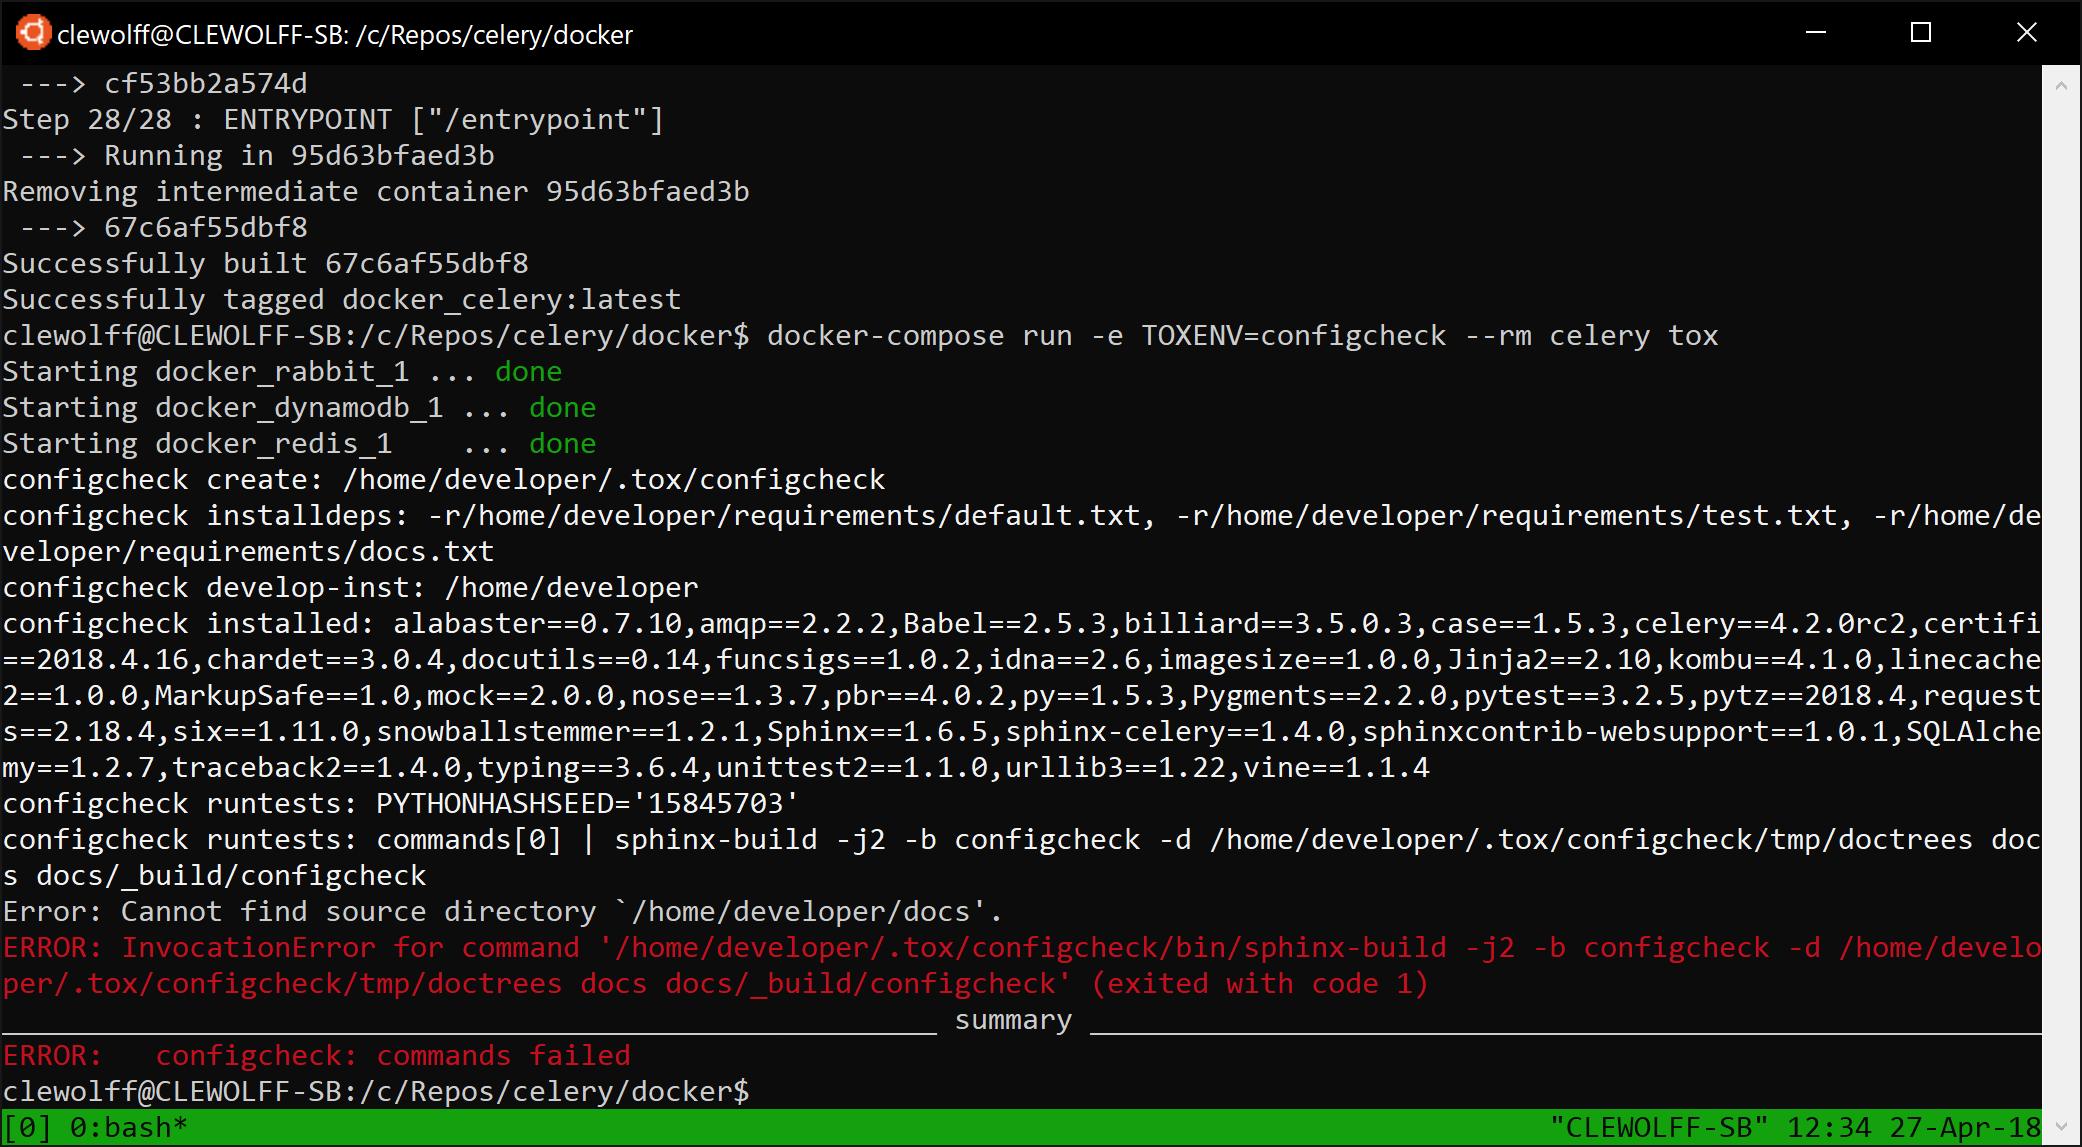 Screenshot of configcheck failure